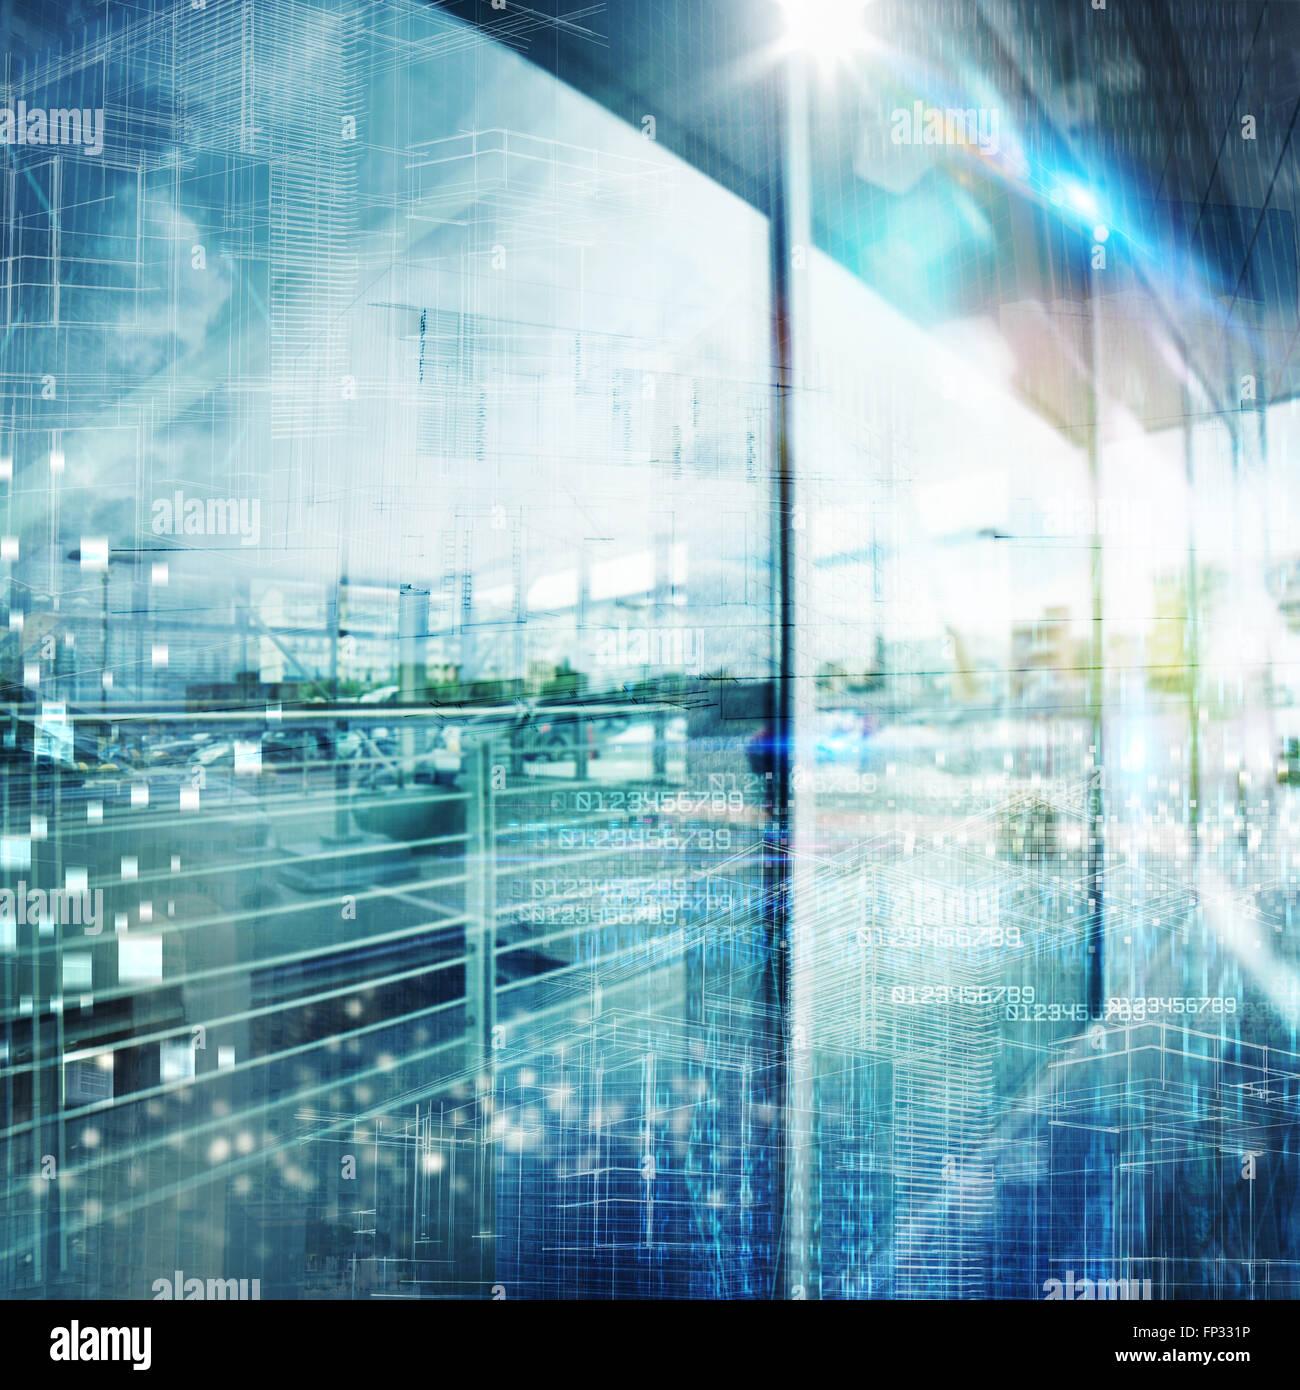 Fondo de tecnología futurista Imagen De Stock